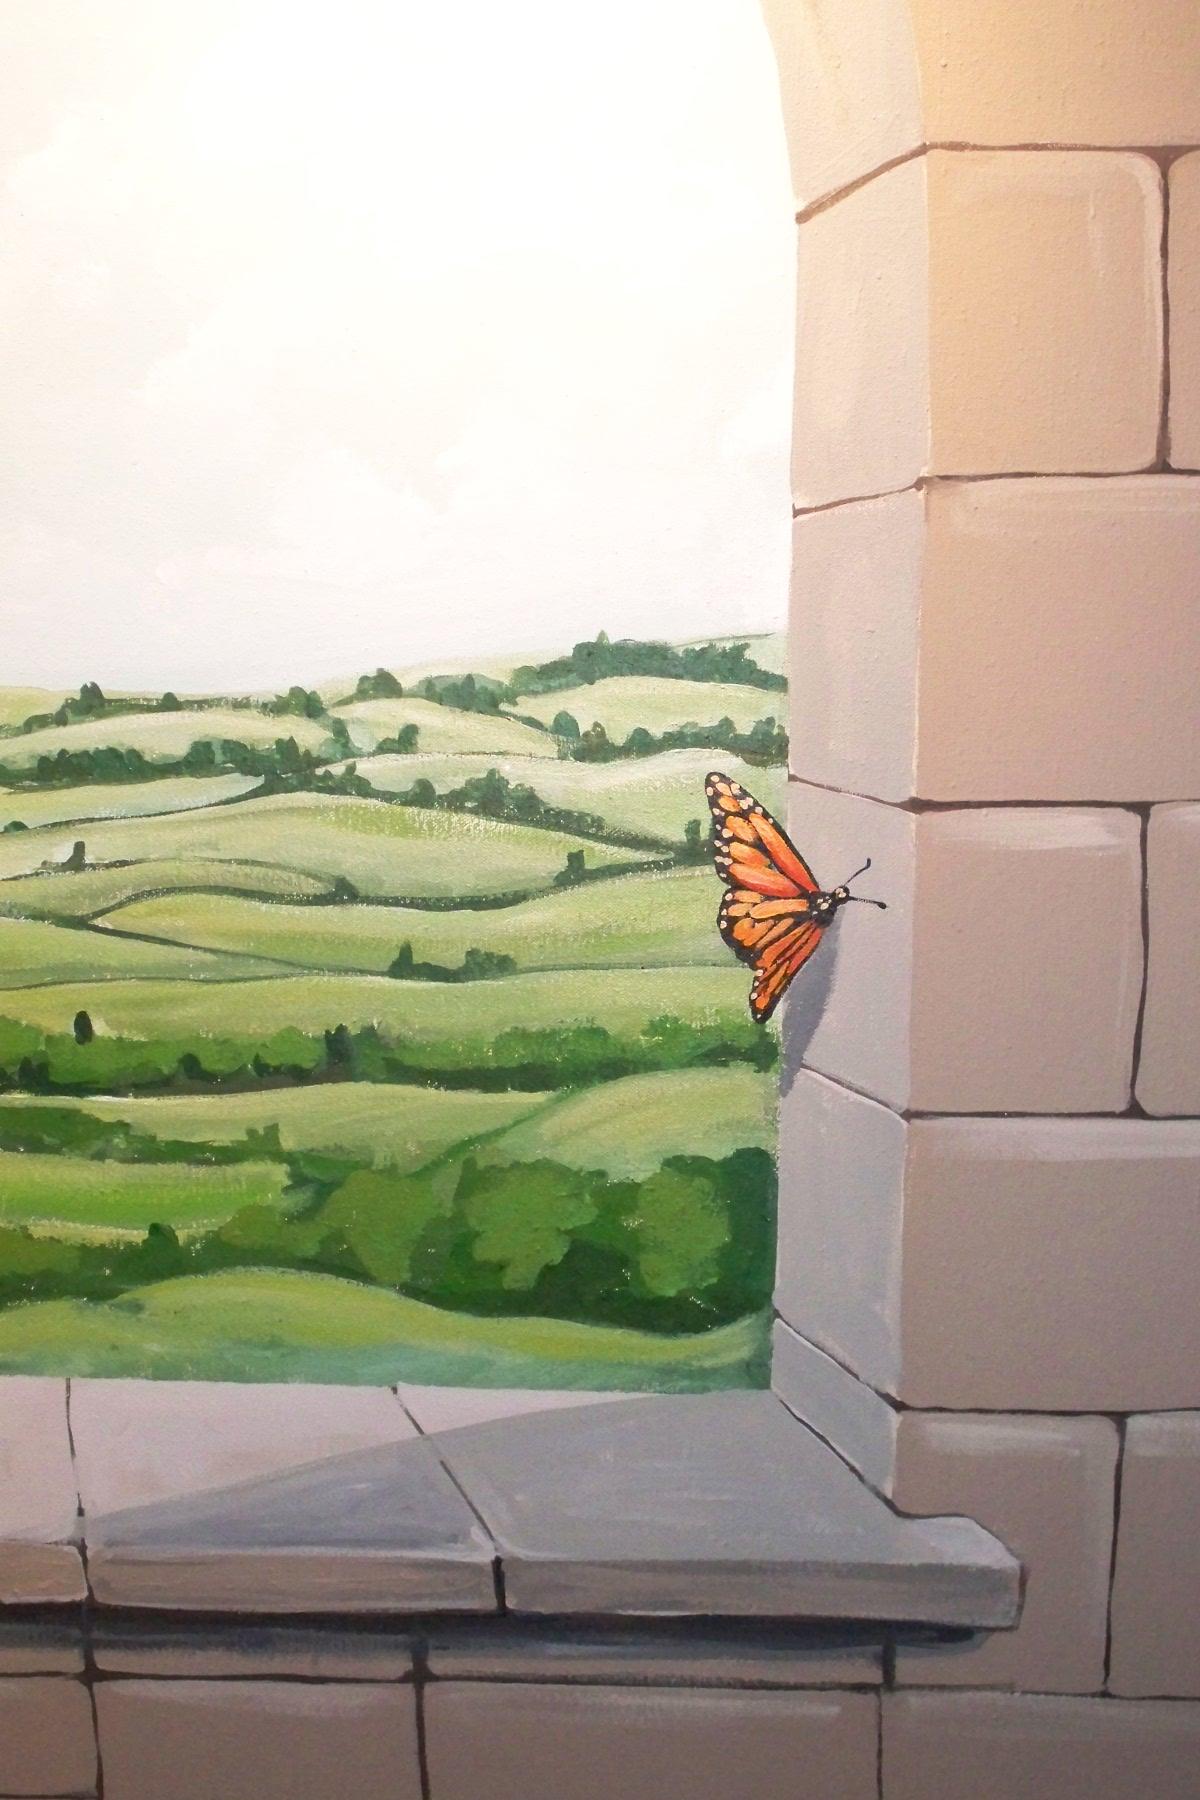 Murals By Marg Butterfly Playroom Mural 2.JPG